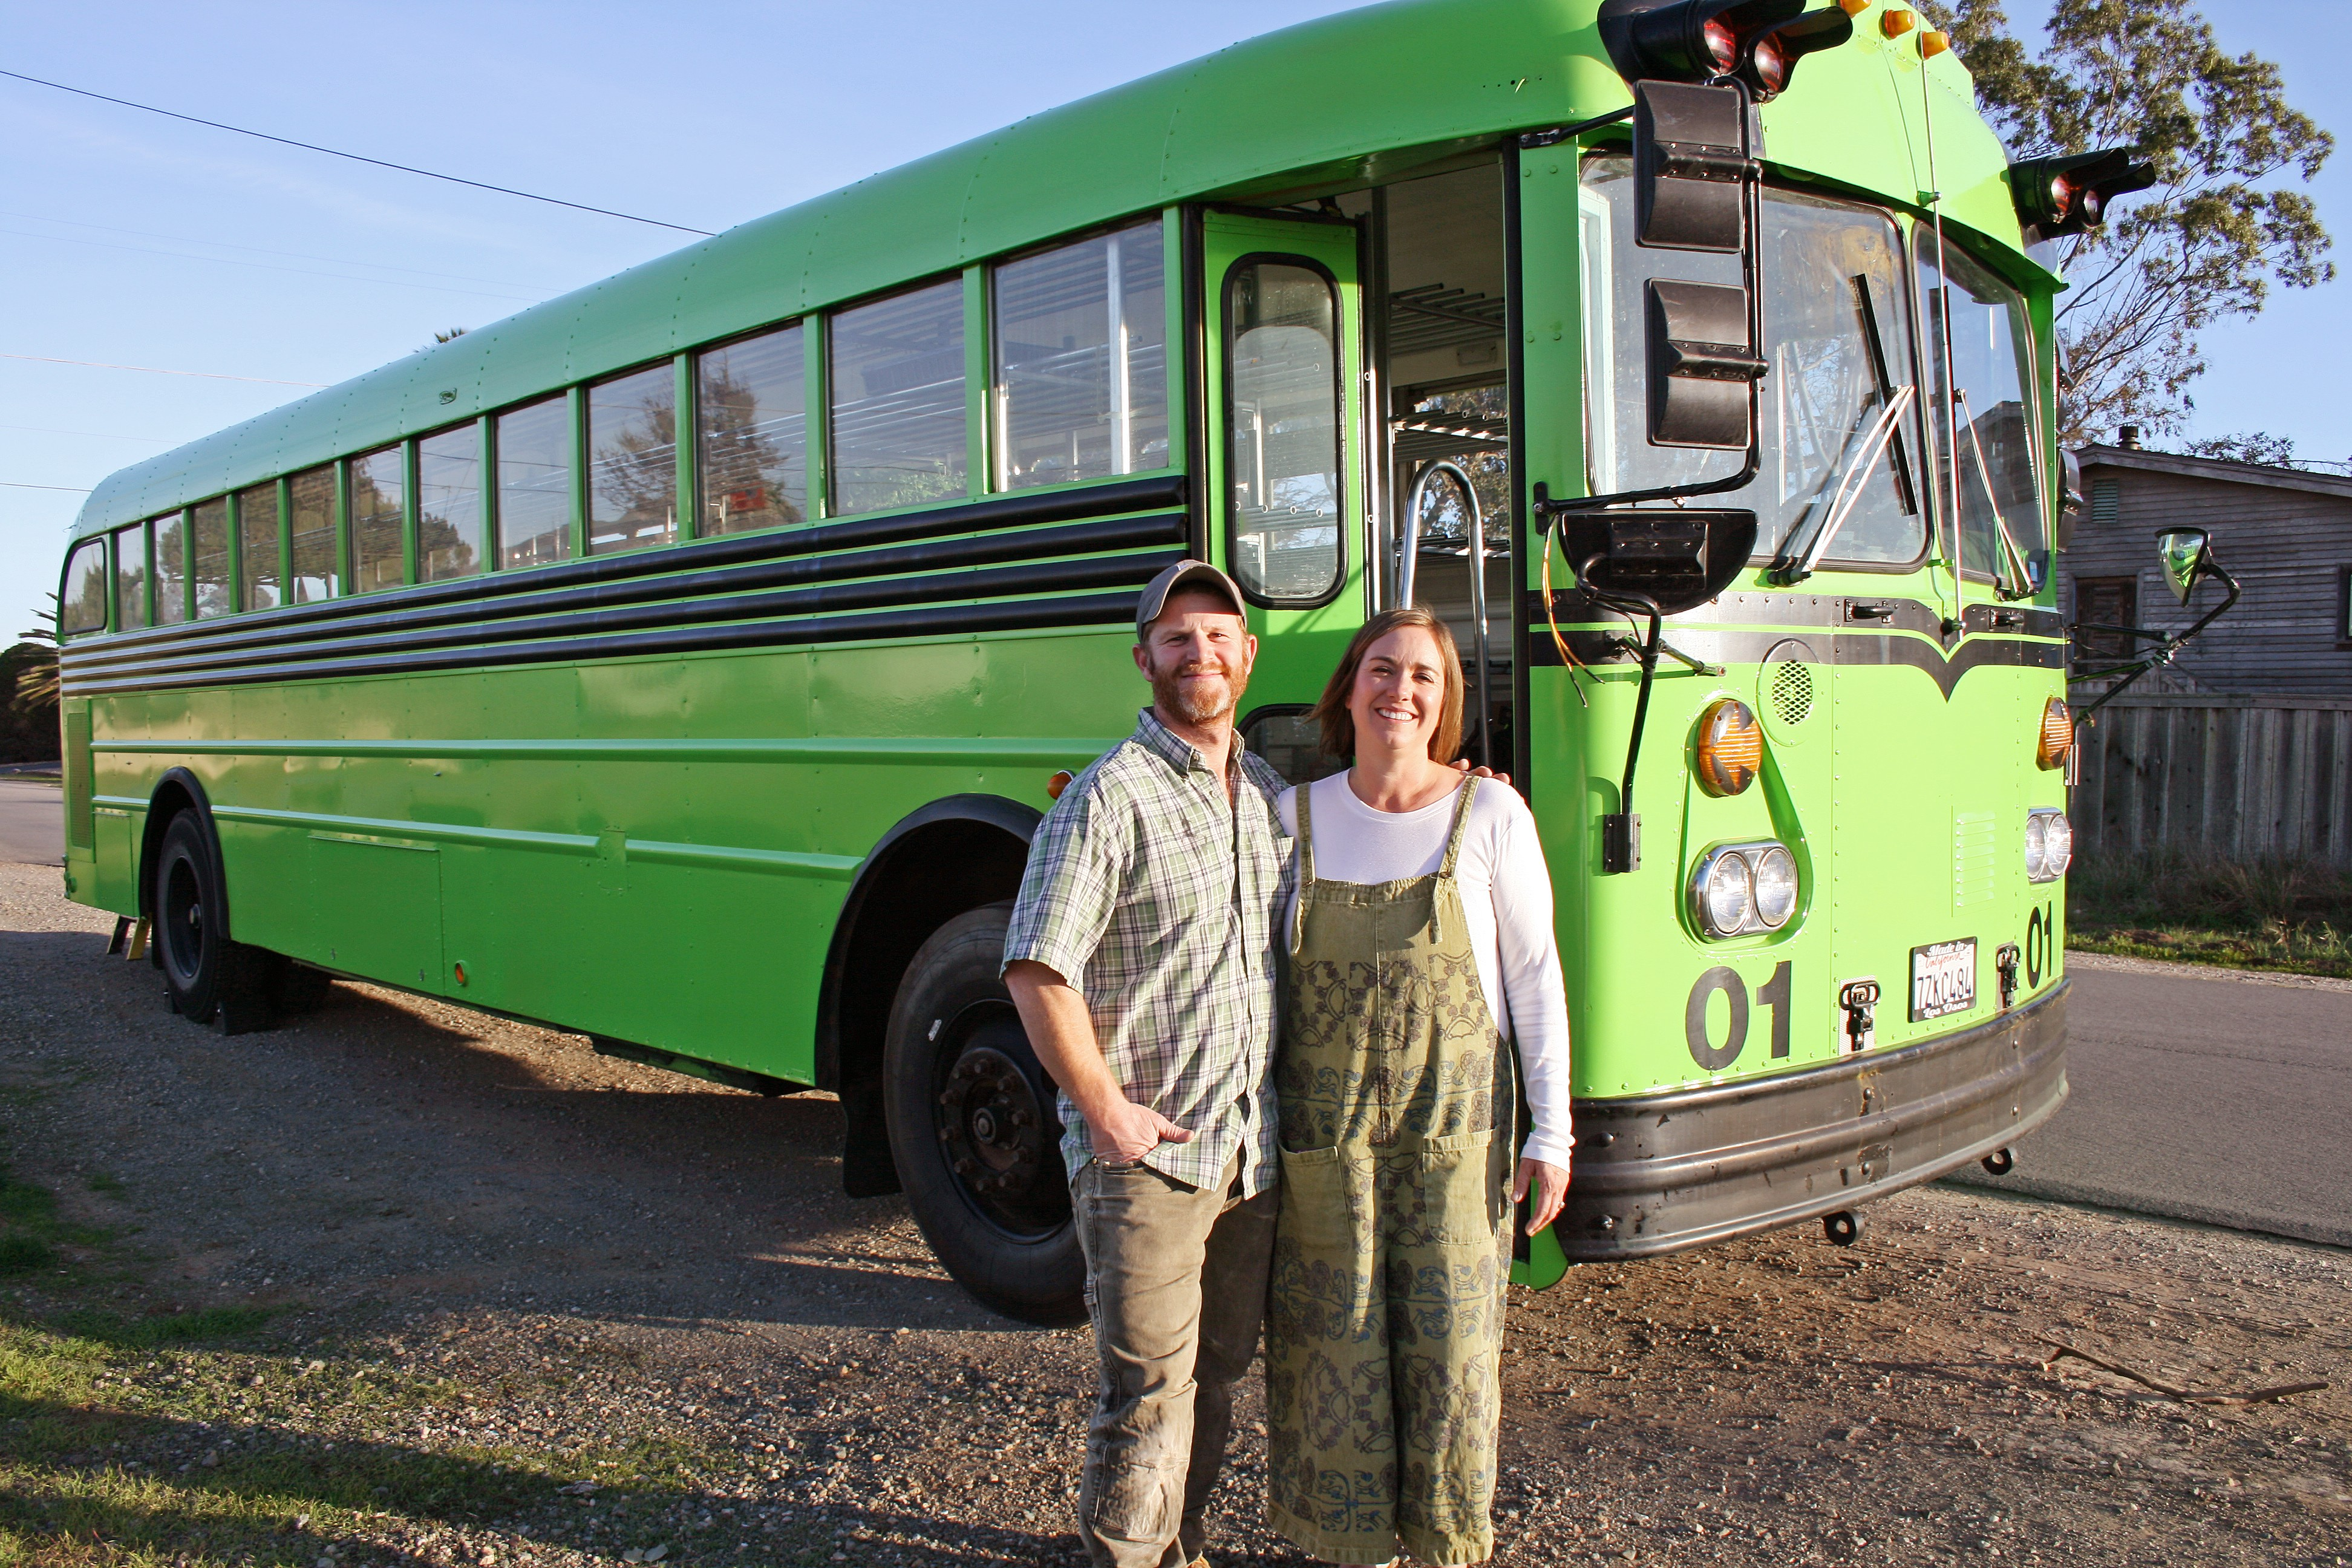 Bloom Microfarm Bus Coming To A Stop Near You Flavor San Luis Obispo New Times San Luis Obispo